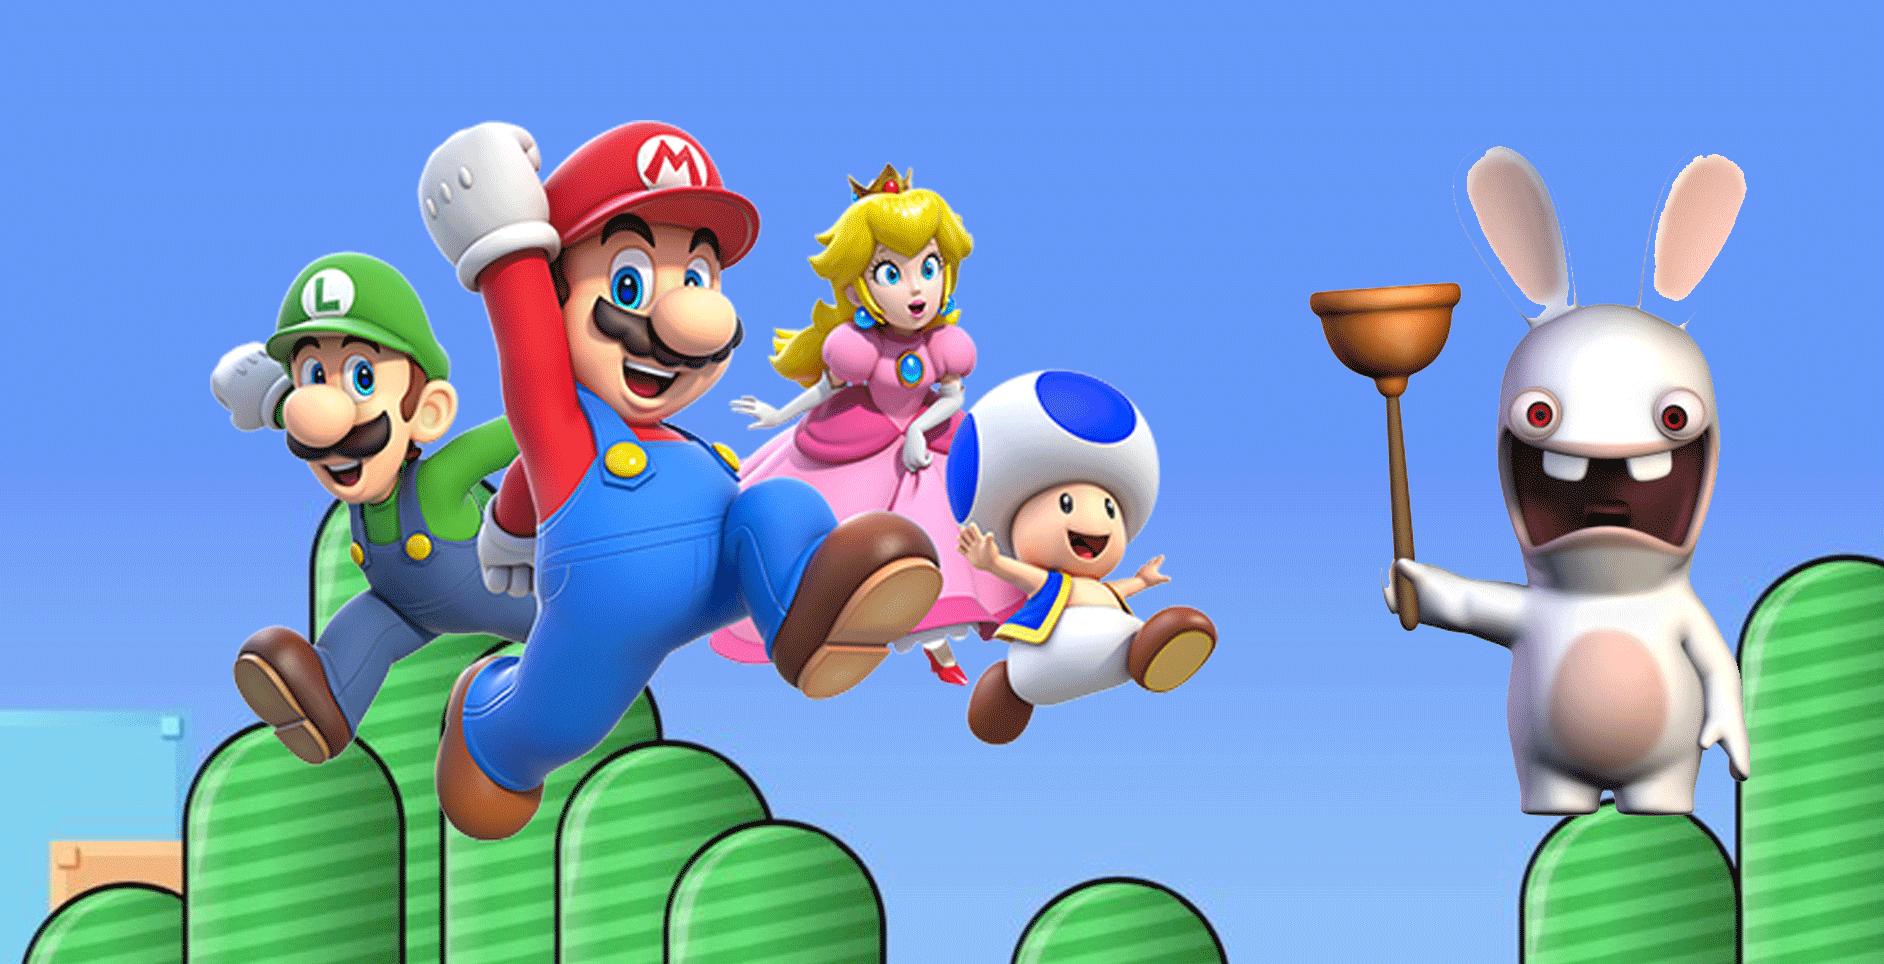 Mario and Rabbid Collision